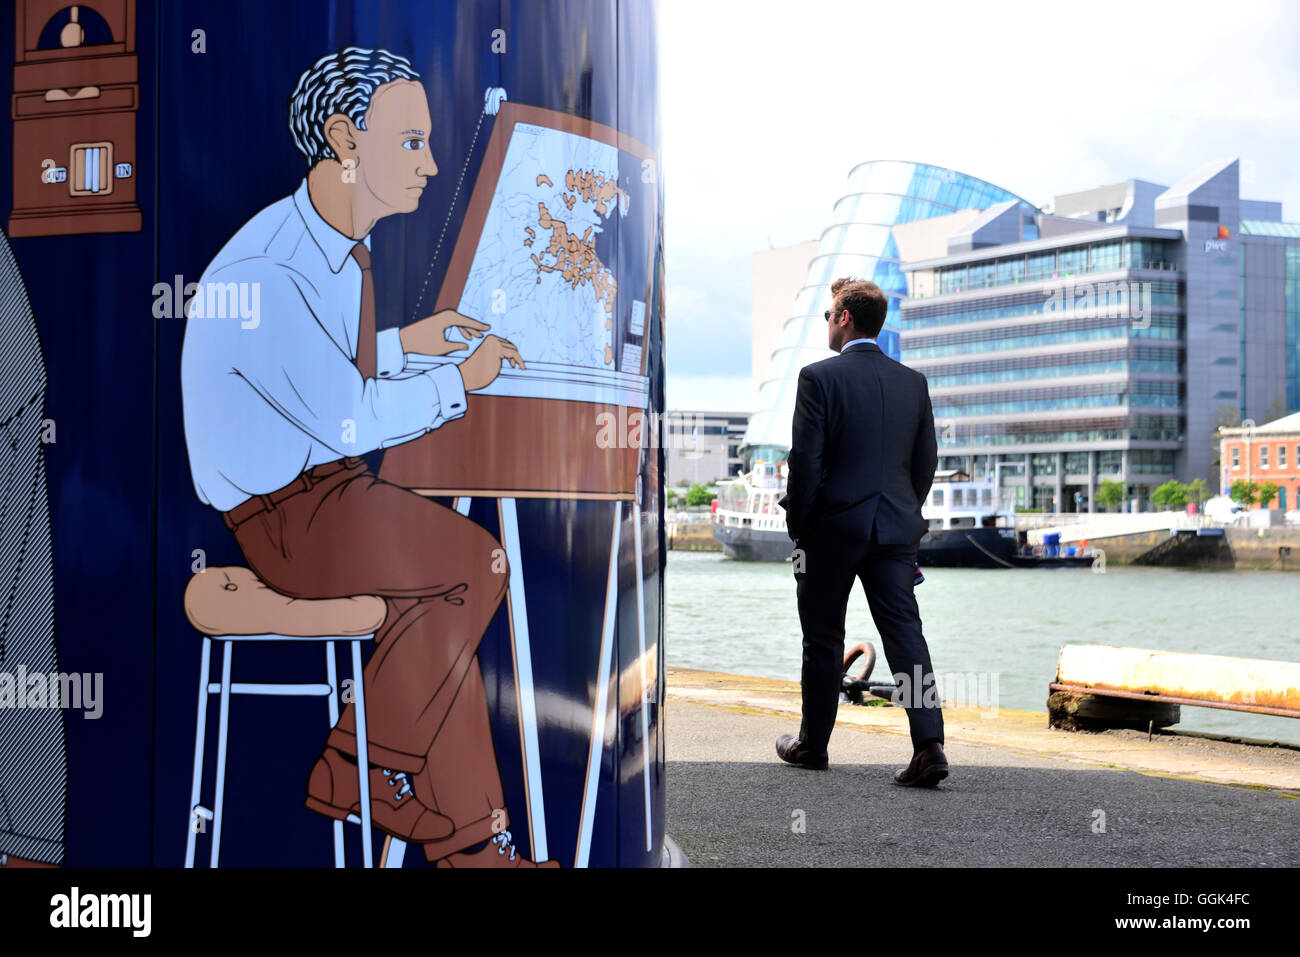 At the Liffey River, Docklands, Dublin, Ireland - Stock Image